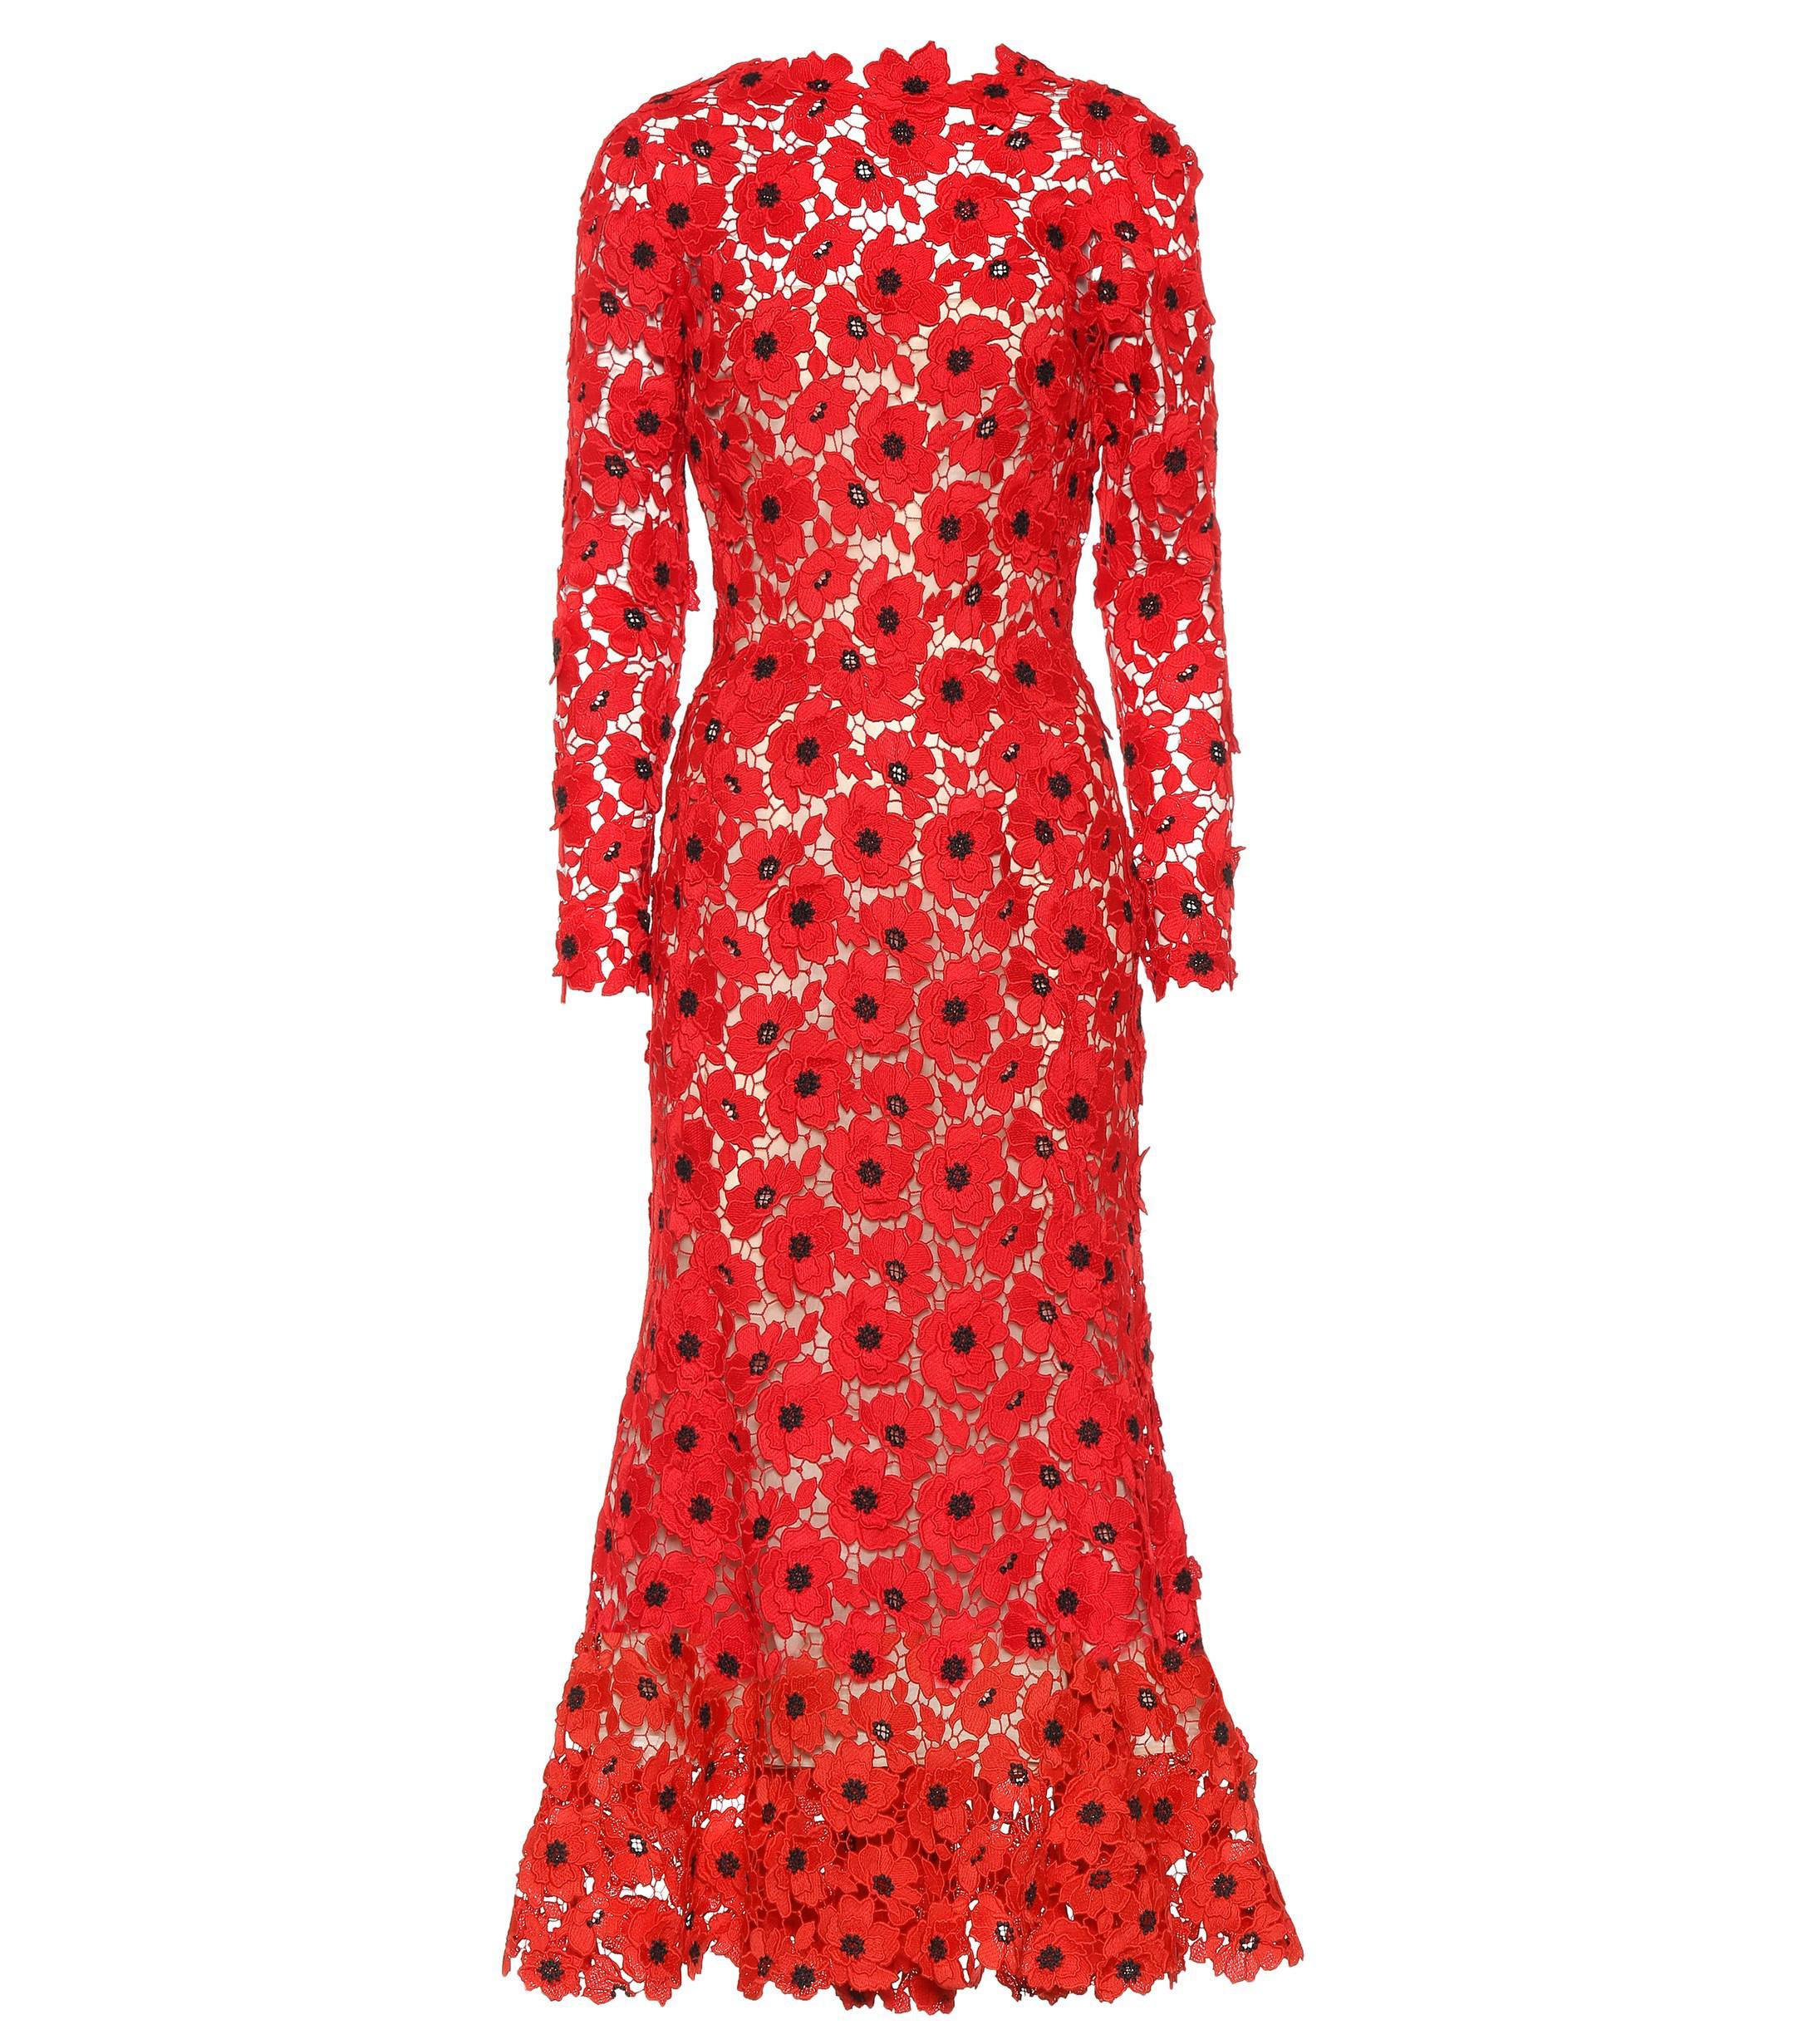 07ffb5fcb66a8 Oscar de la Renta Floral Guipure Lace Dress in Red - Lyst